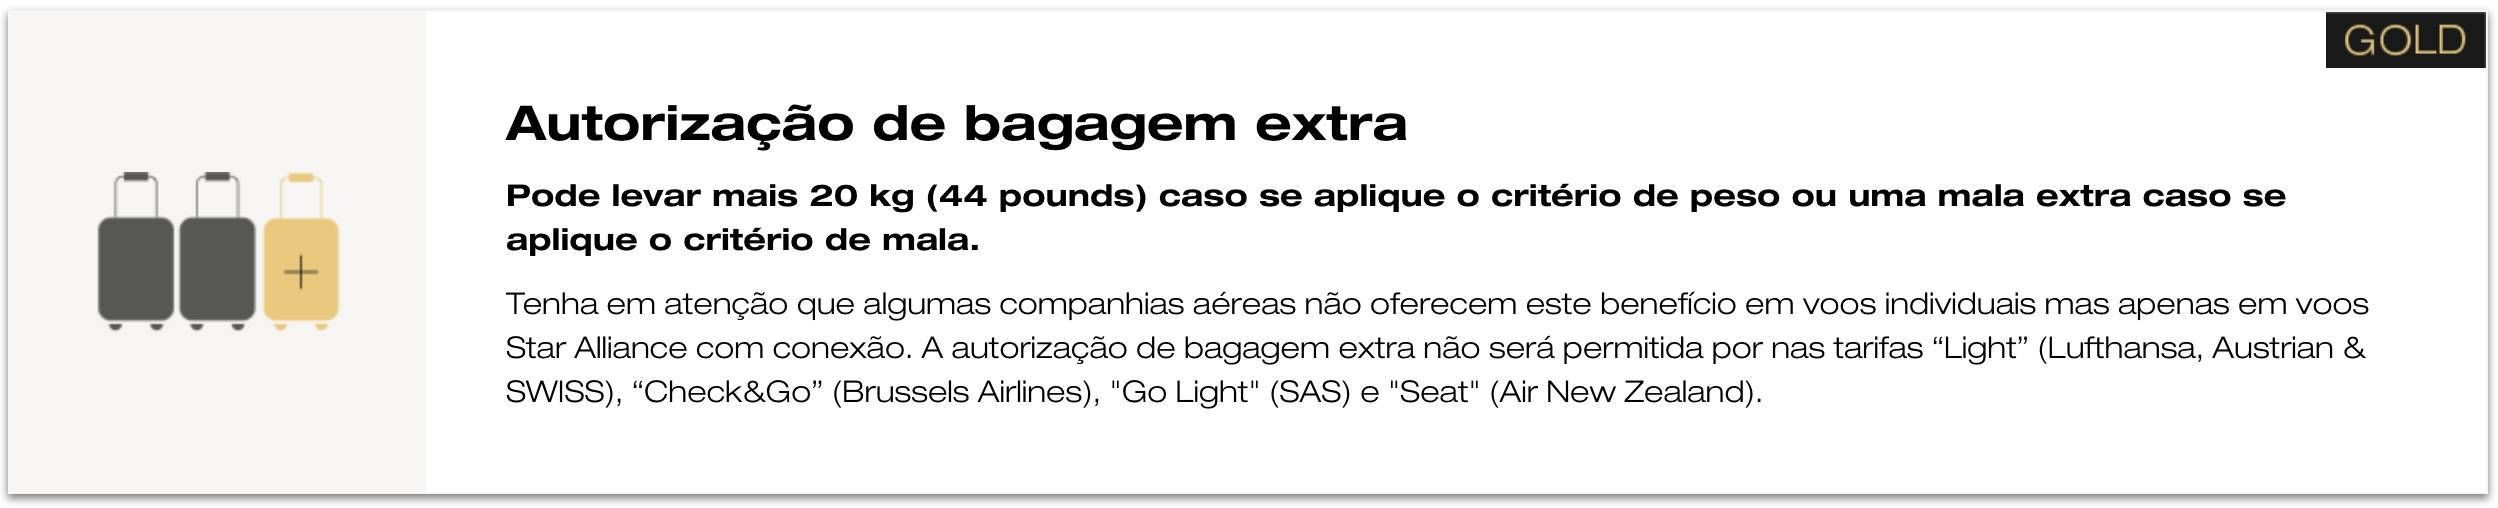 Bagagem extra Star Alliance Gold